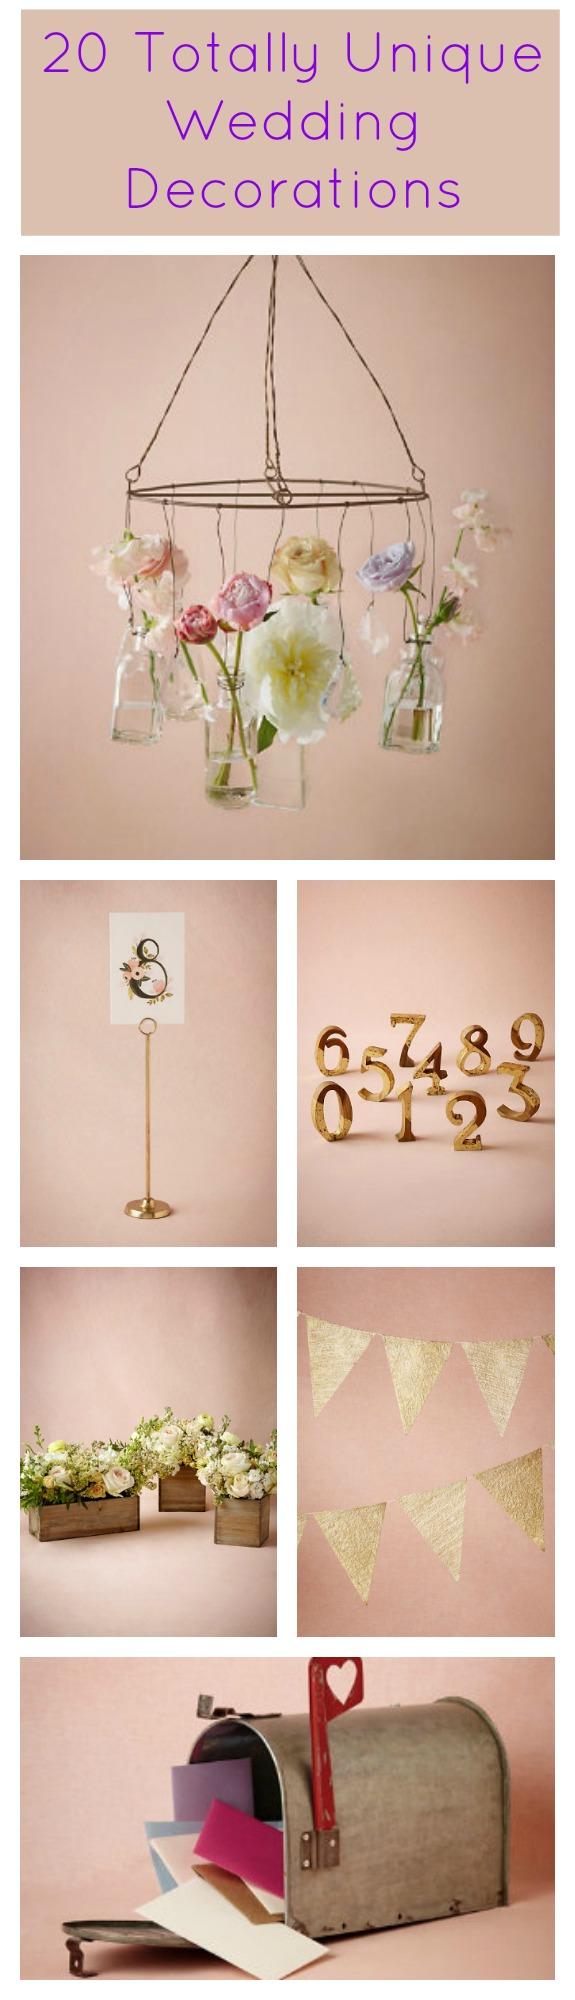 20 totally unique wedding decorations rustic wedding chic. Black Bedroom Furniture Sets. Home Design Ideas